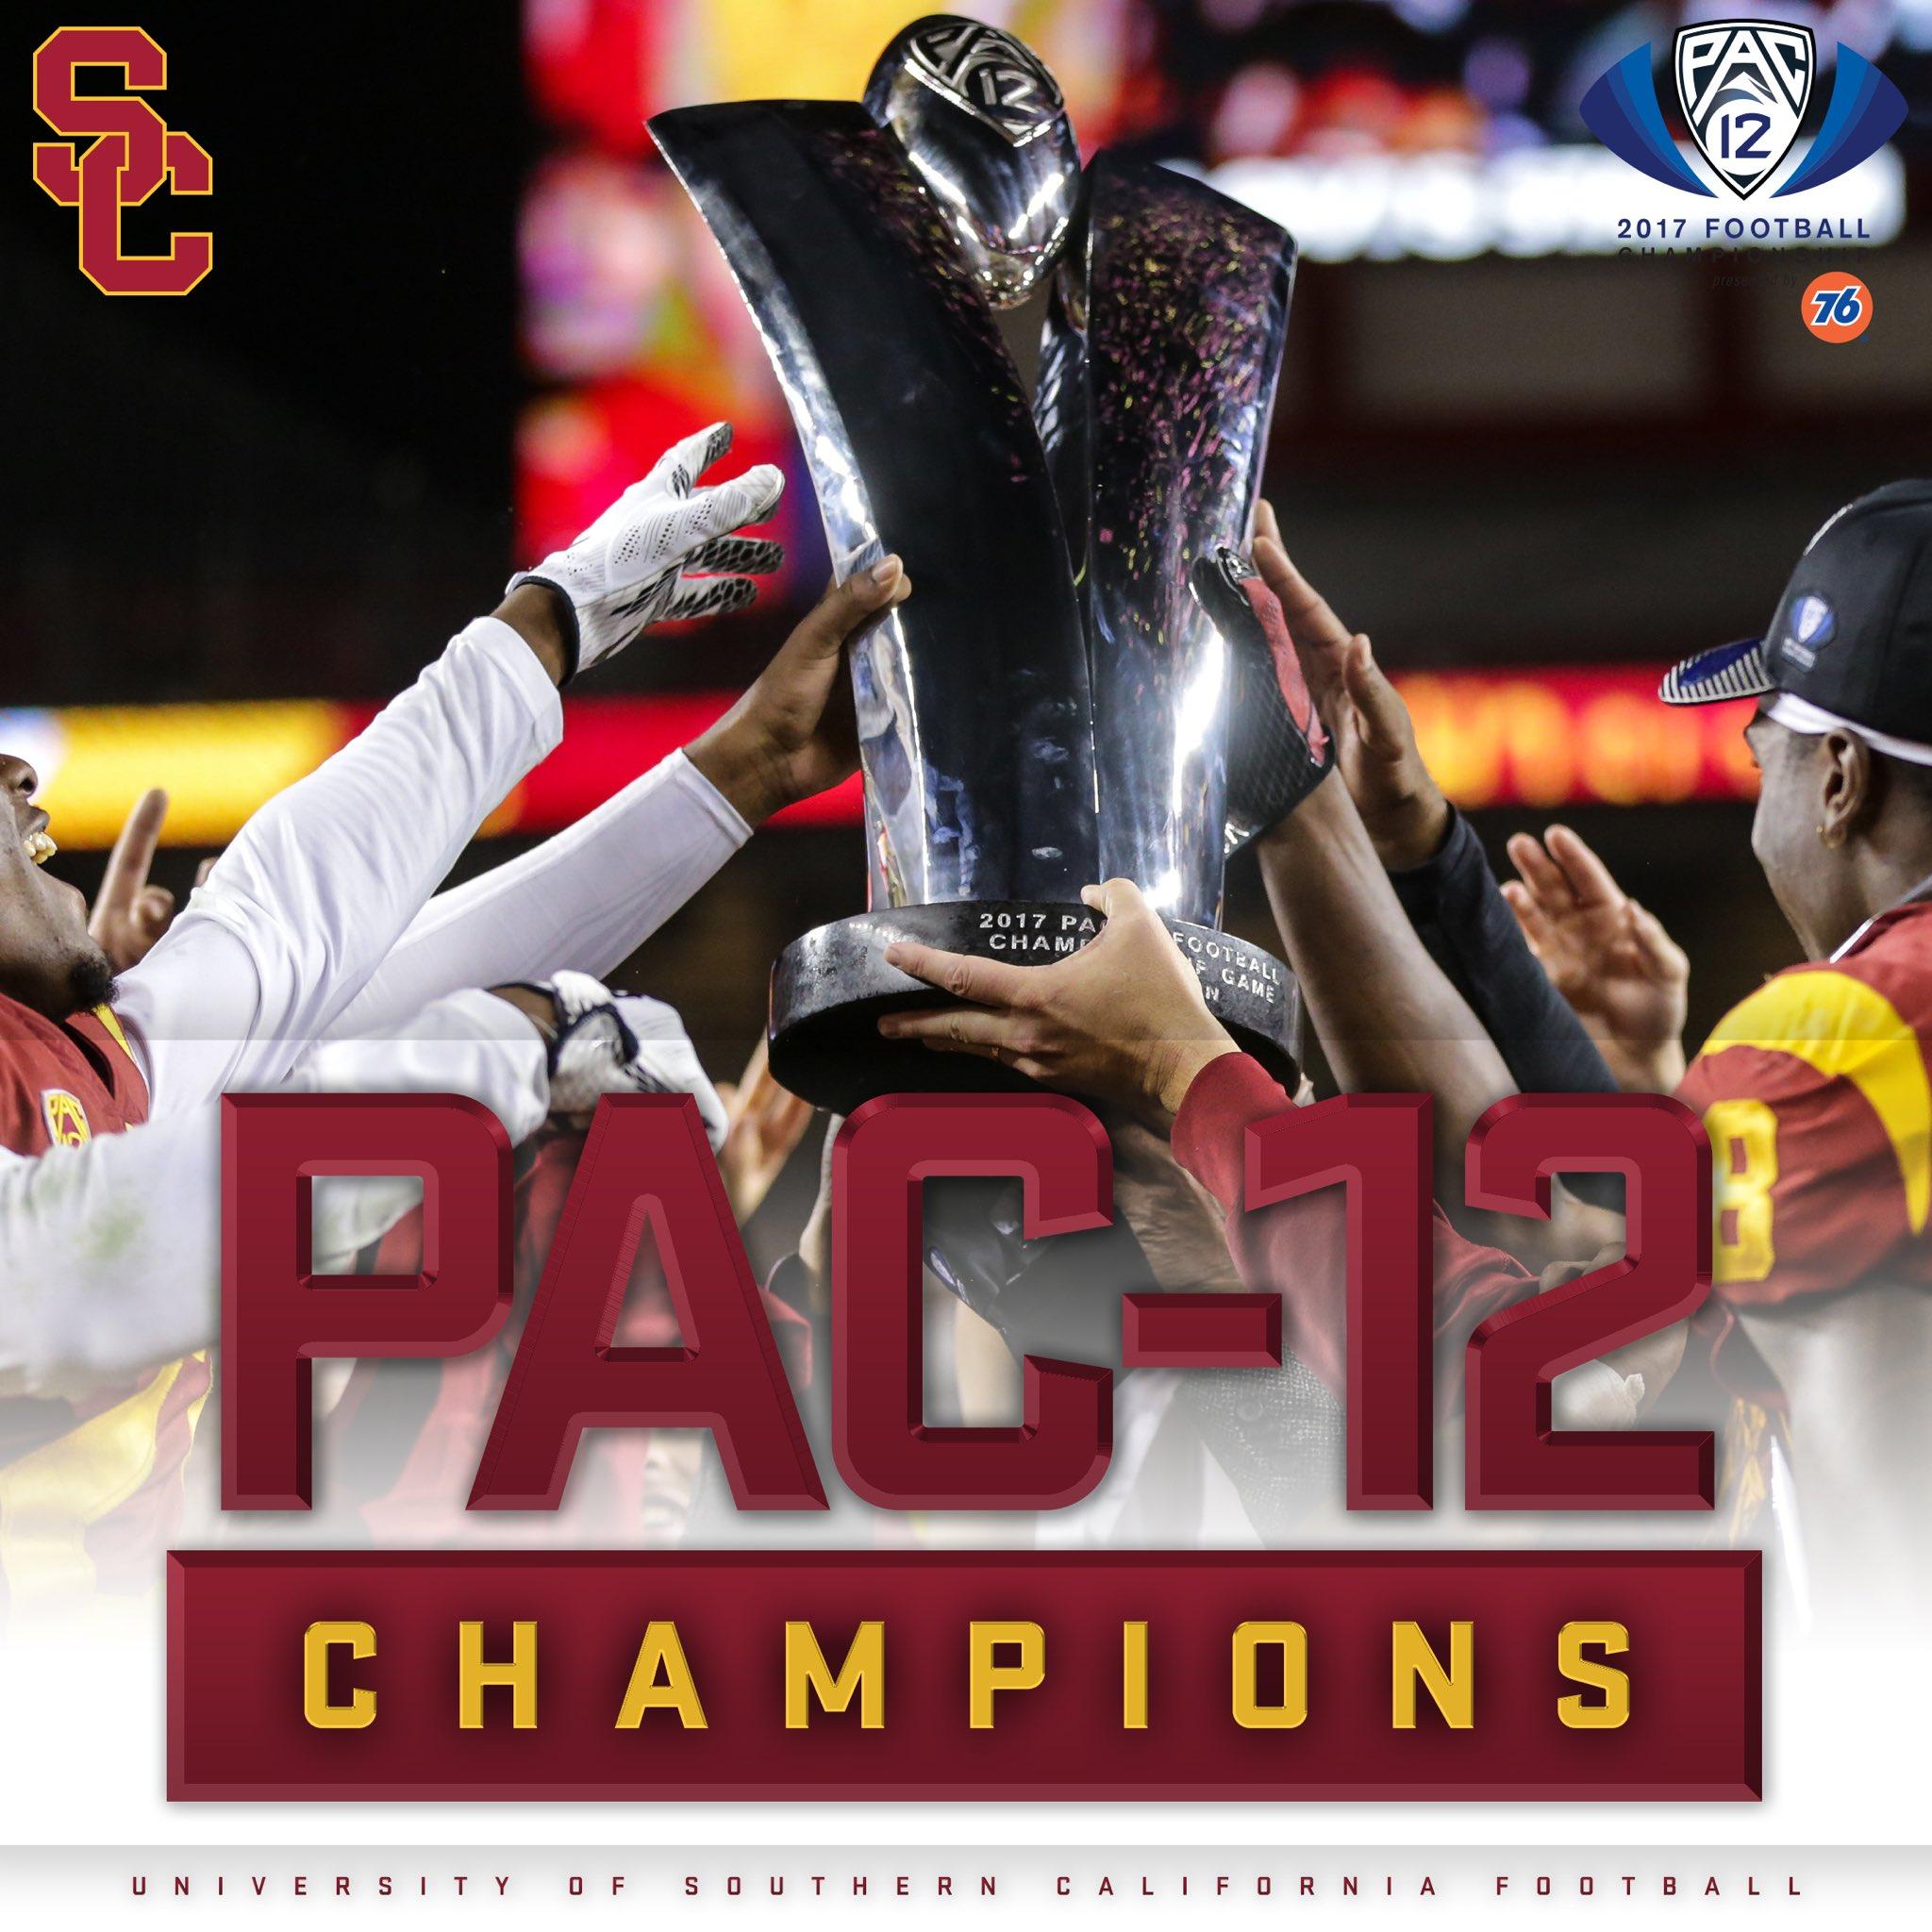 USC vence a Pac-12 em 2017